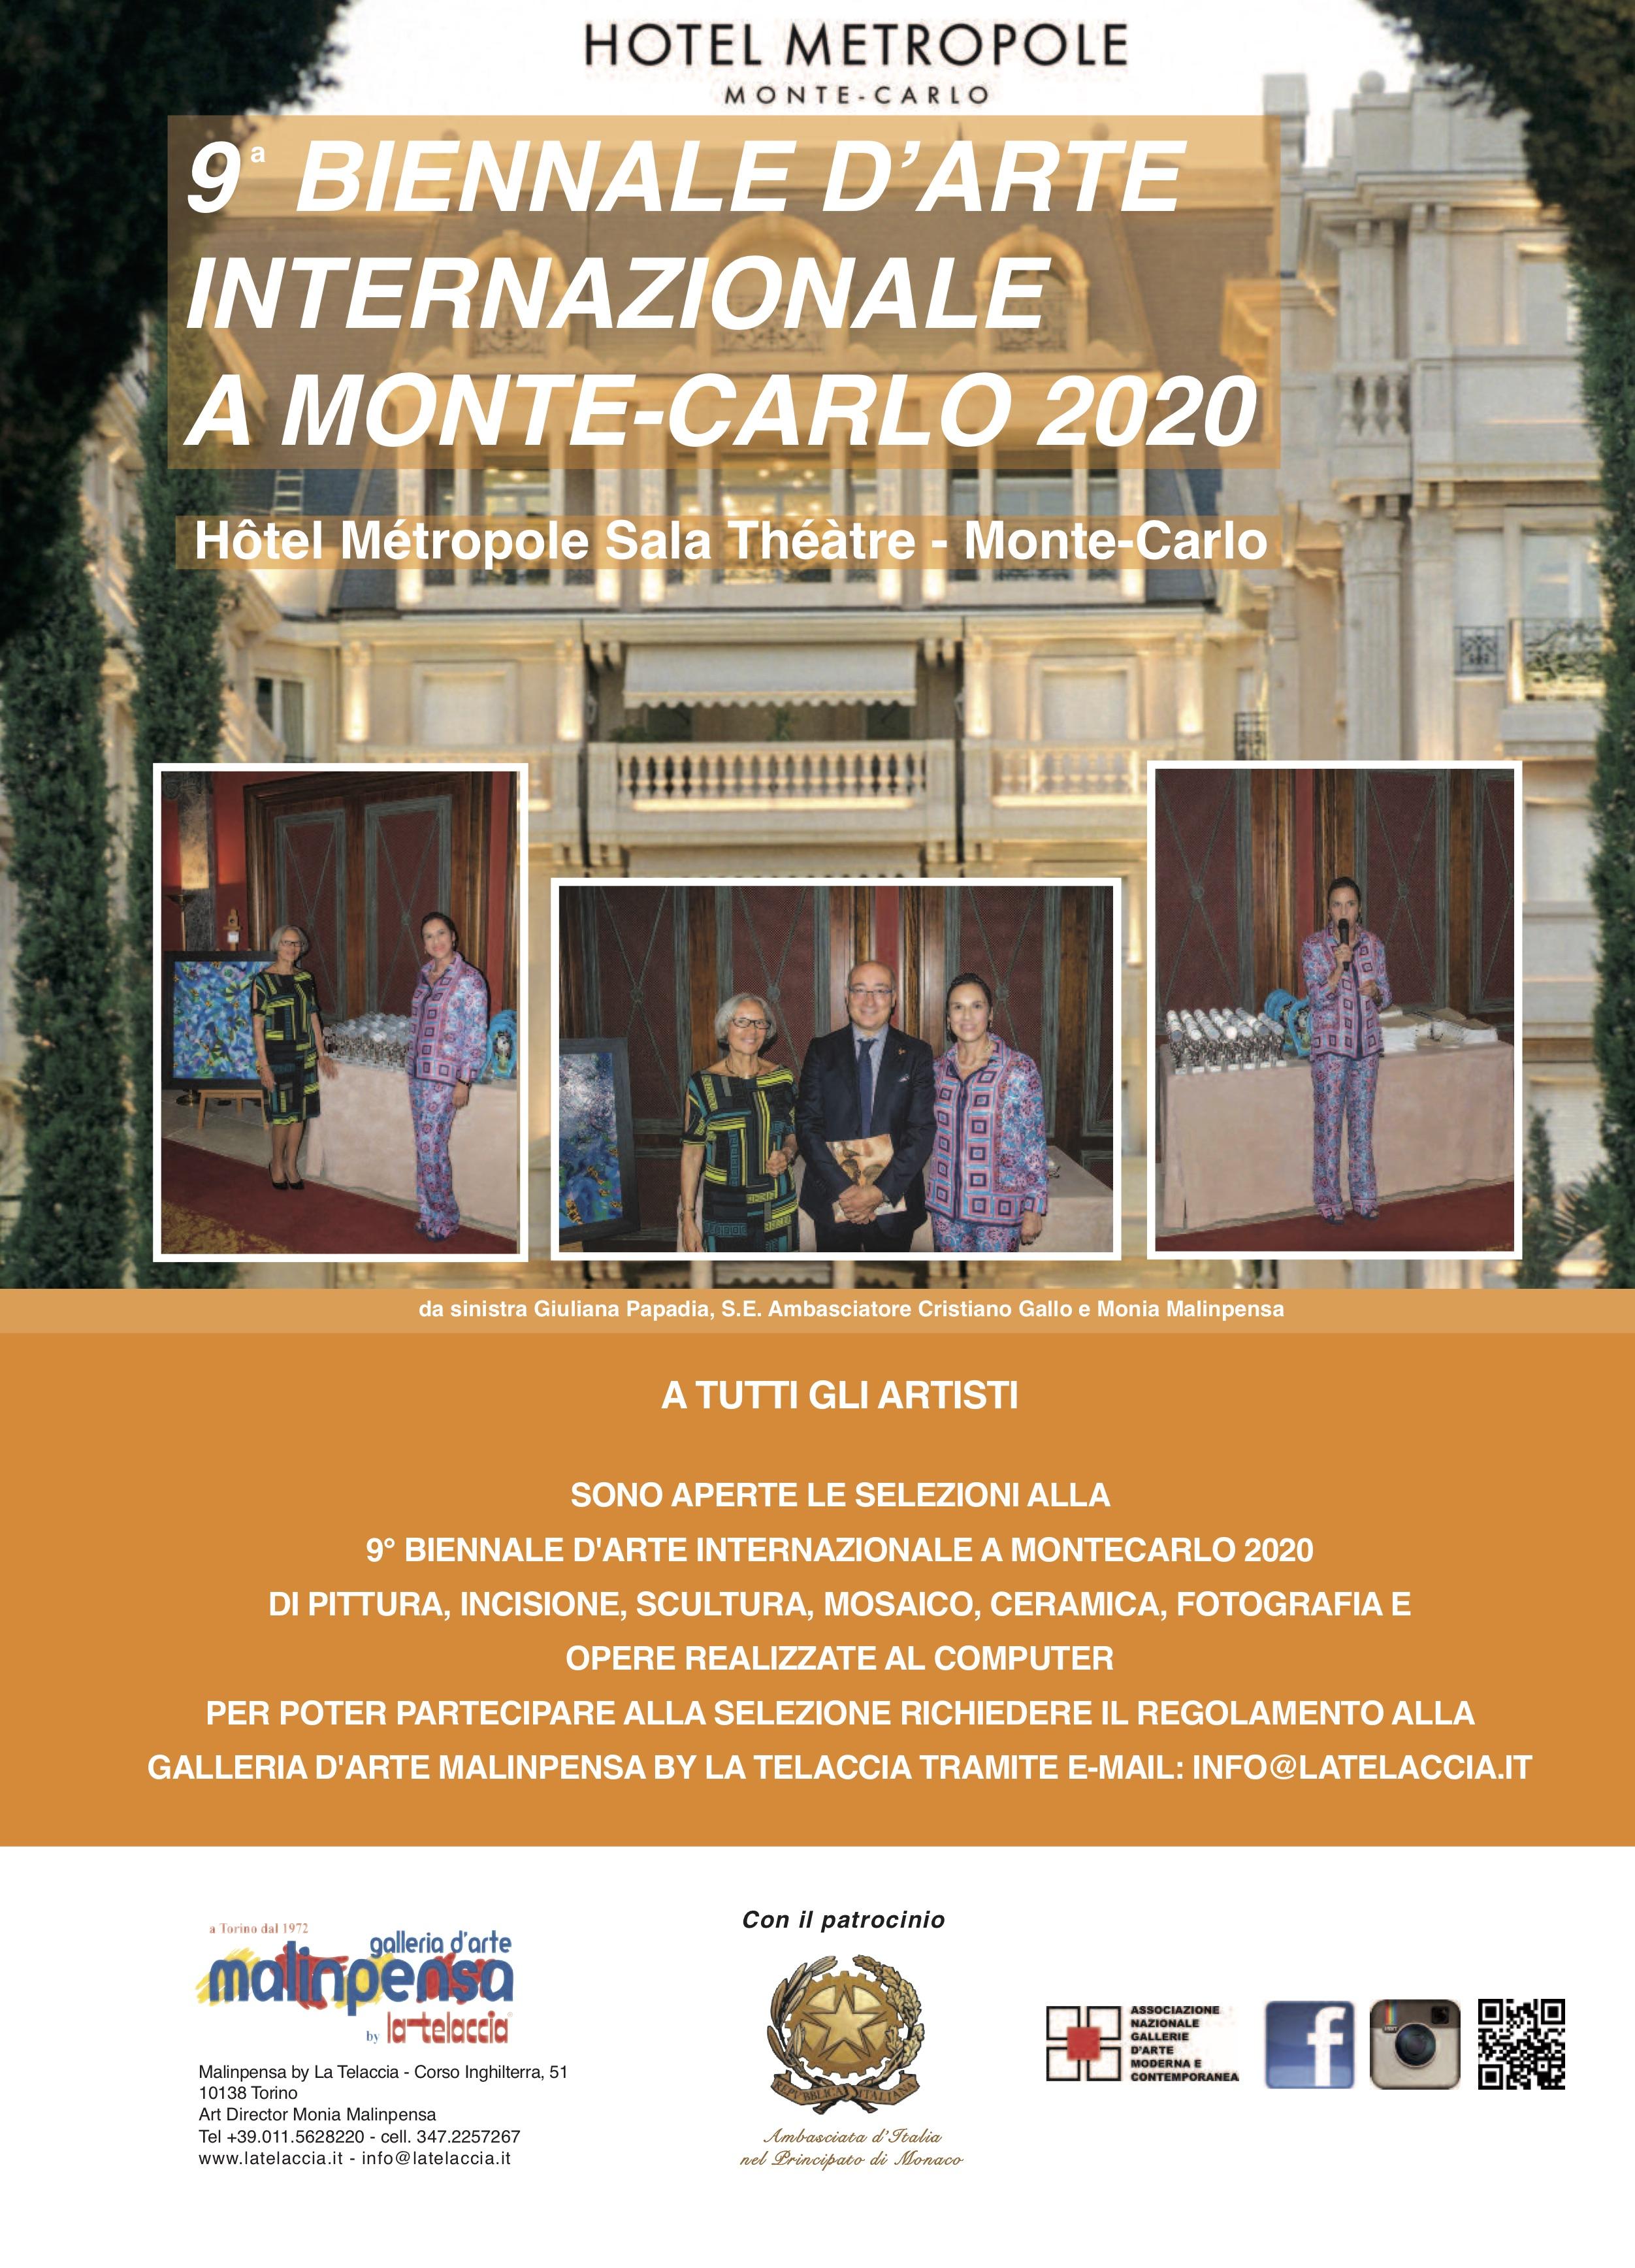 Montecarlo jpg.jpg